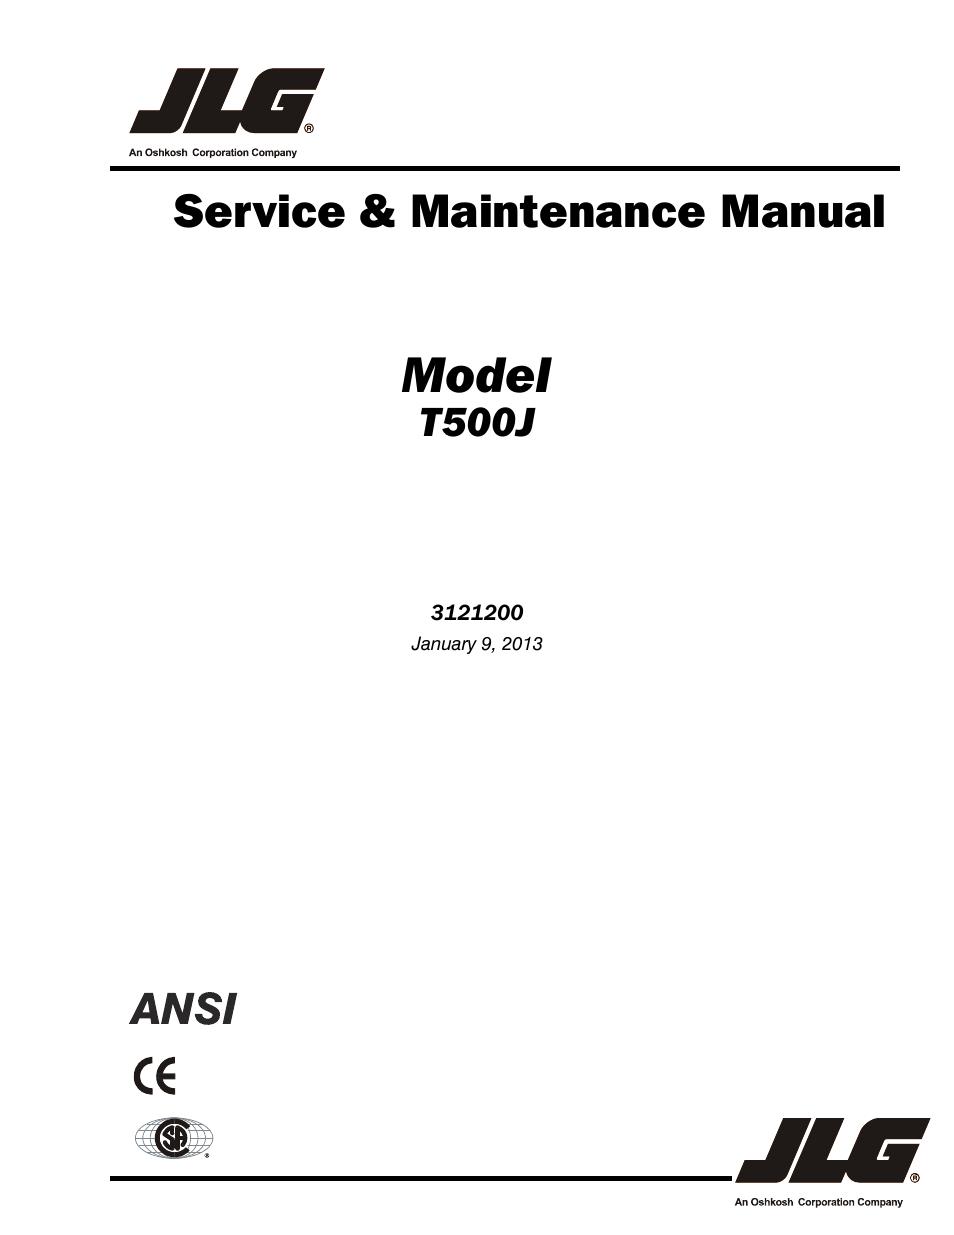 jlg t500j service manual user manual